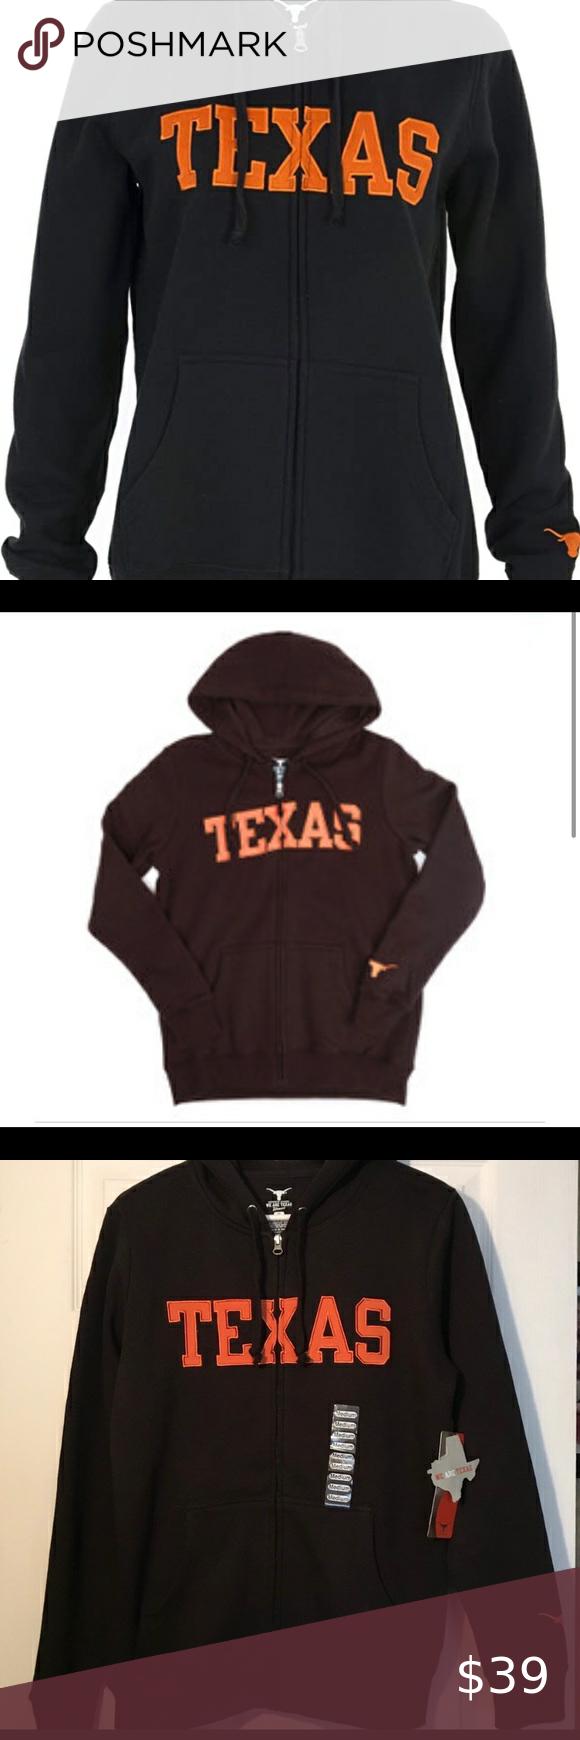 Texas Longhorns Women S Blackblock Full Ziphoodie New With Tags Texas Women S Zip Hoodie M Authentic Apparel T Sweatshirt Tops Carhartt Sweatshirts Knit Hoodie [ 1740 x 580 Pixel ]